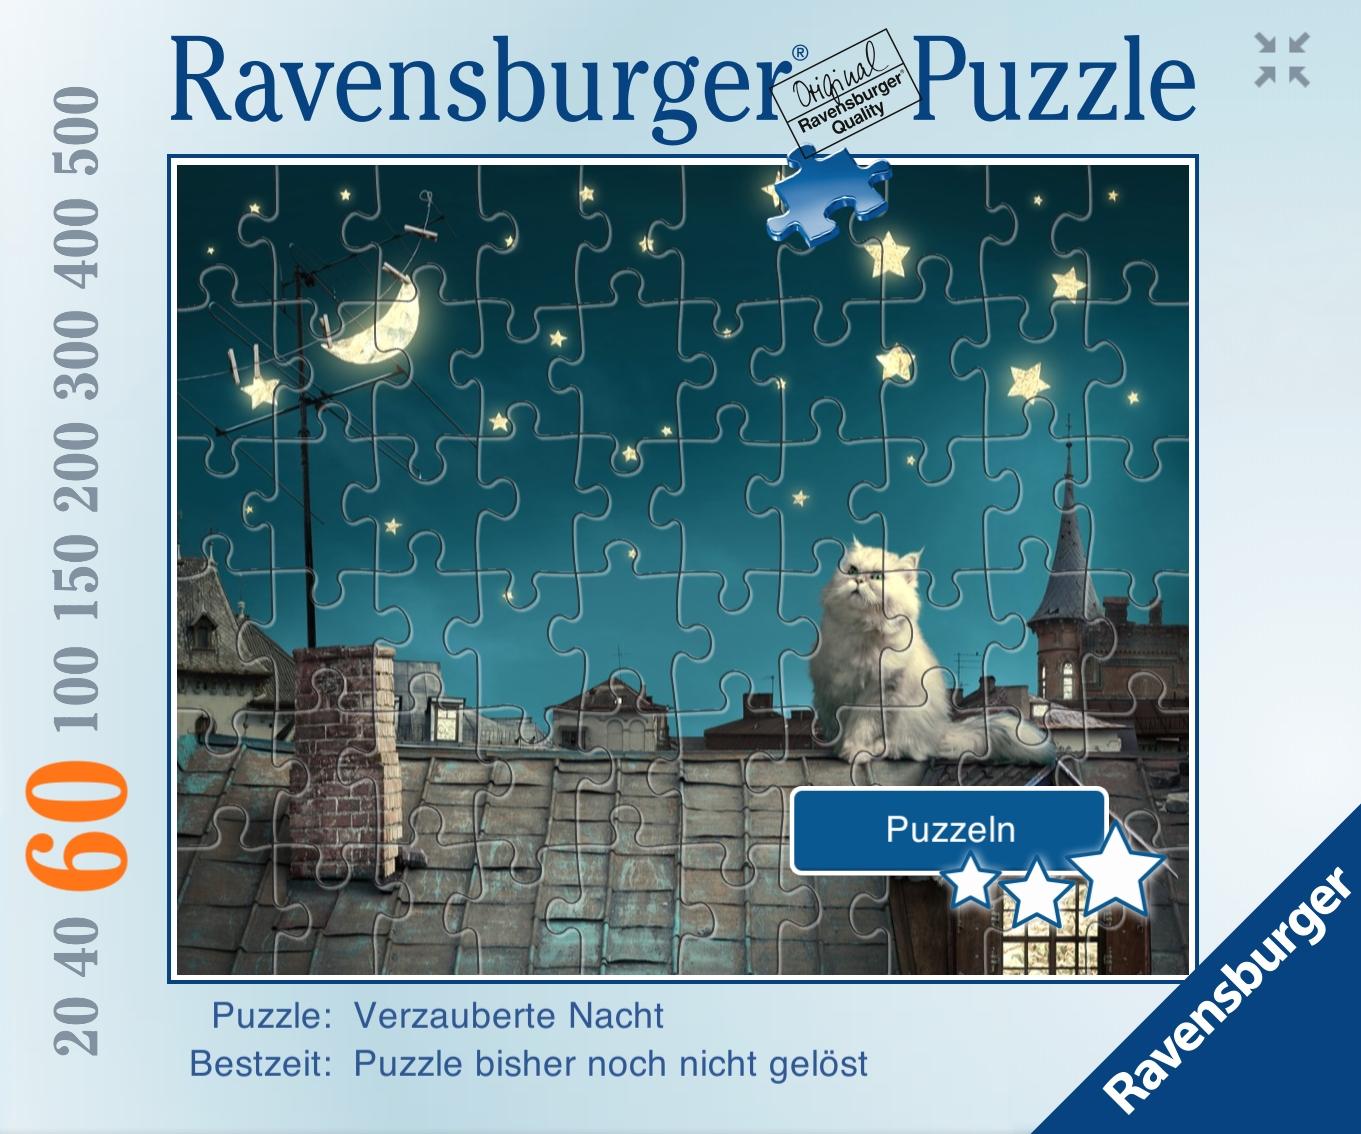 Ravensburger Puzzle – Der Klassiker als App